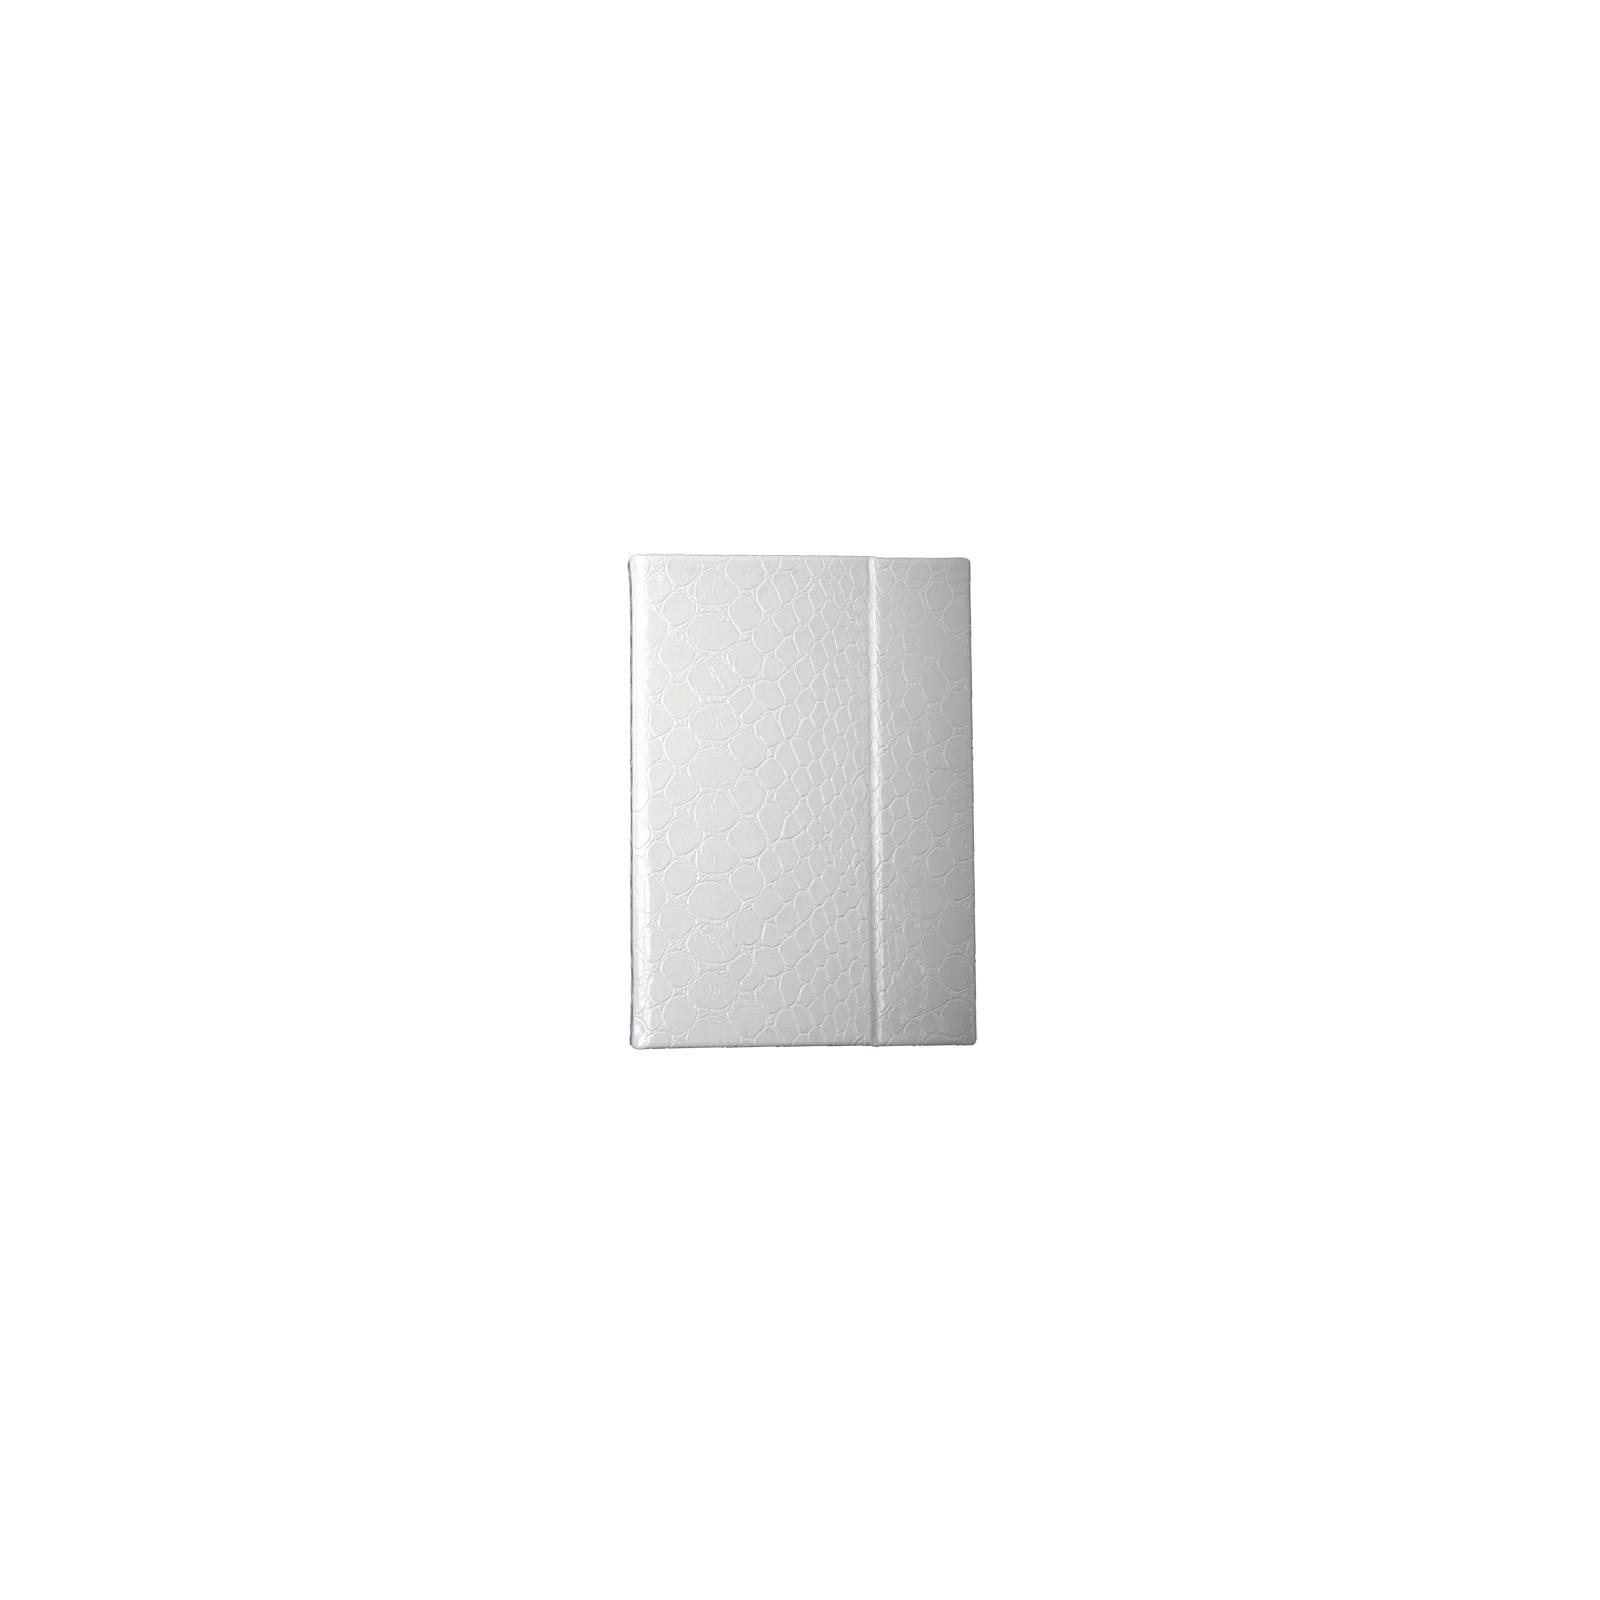 Чехол для планшета Vento 9 Desire glossy - White reptile